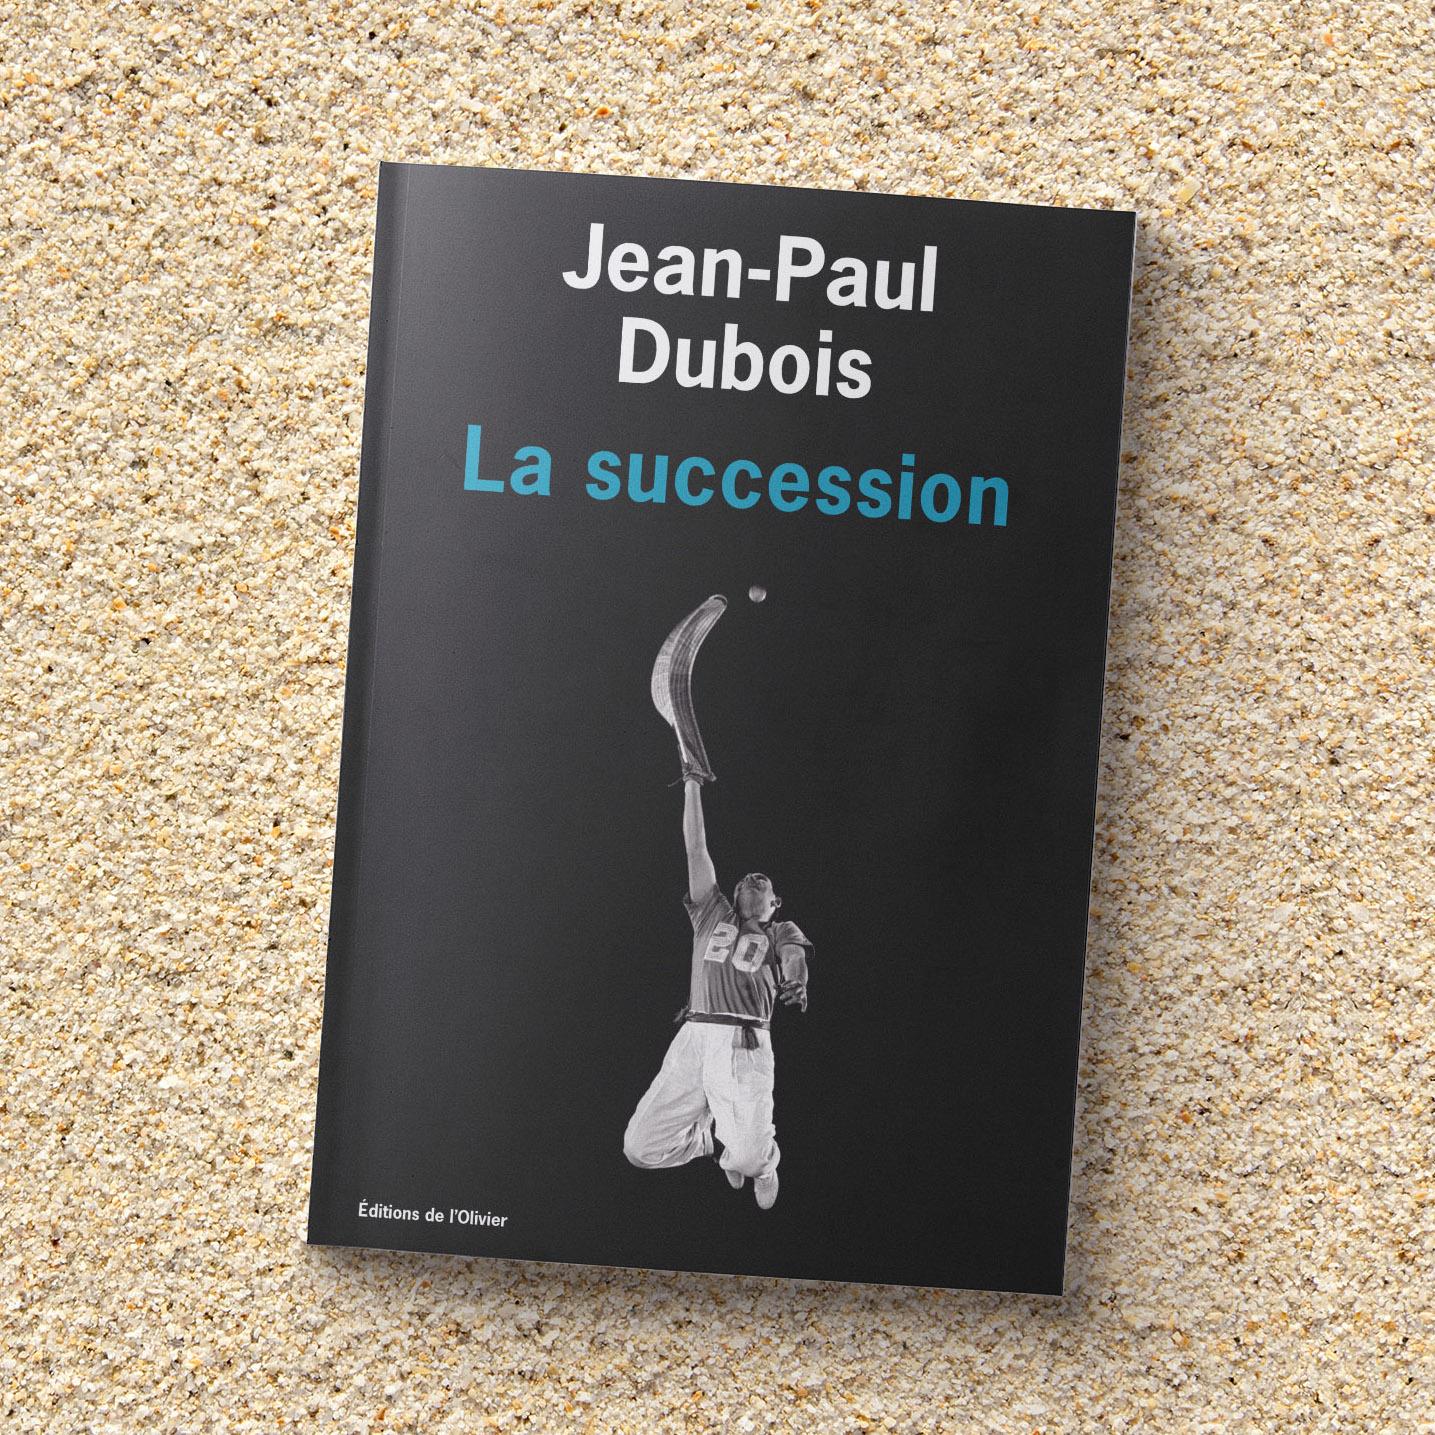 The Legacy by Jean-Paul Dubois